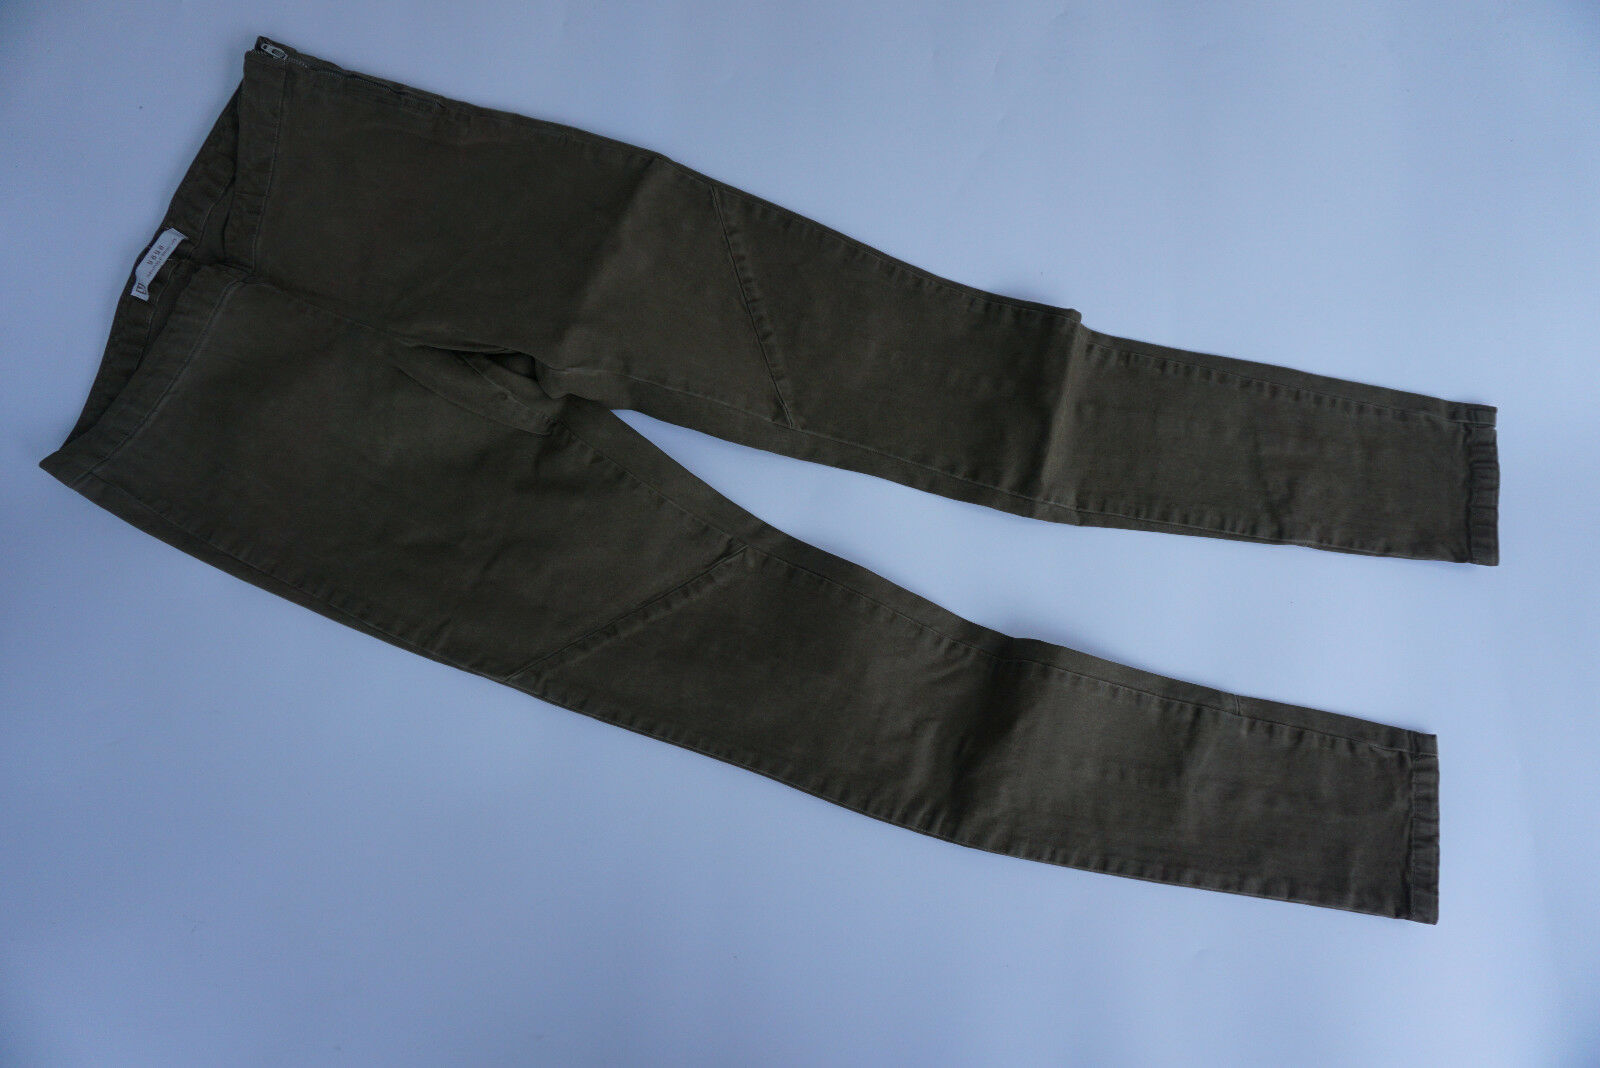 YAYA Damen super Stretch Legging Hose Röhren Skinny Gr.36 L32 oliv grün NEU